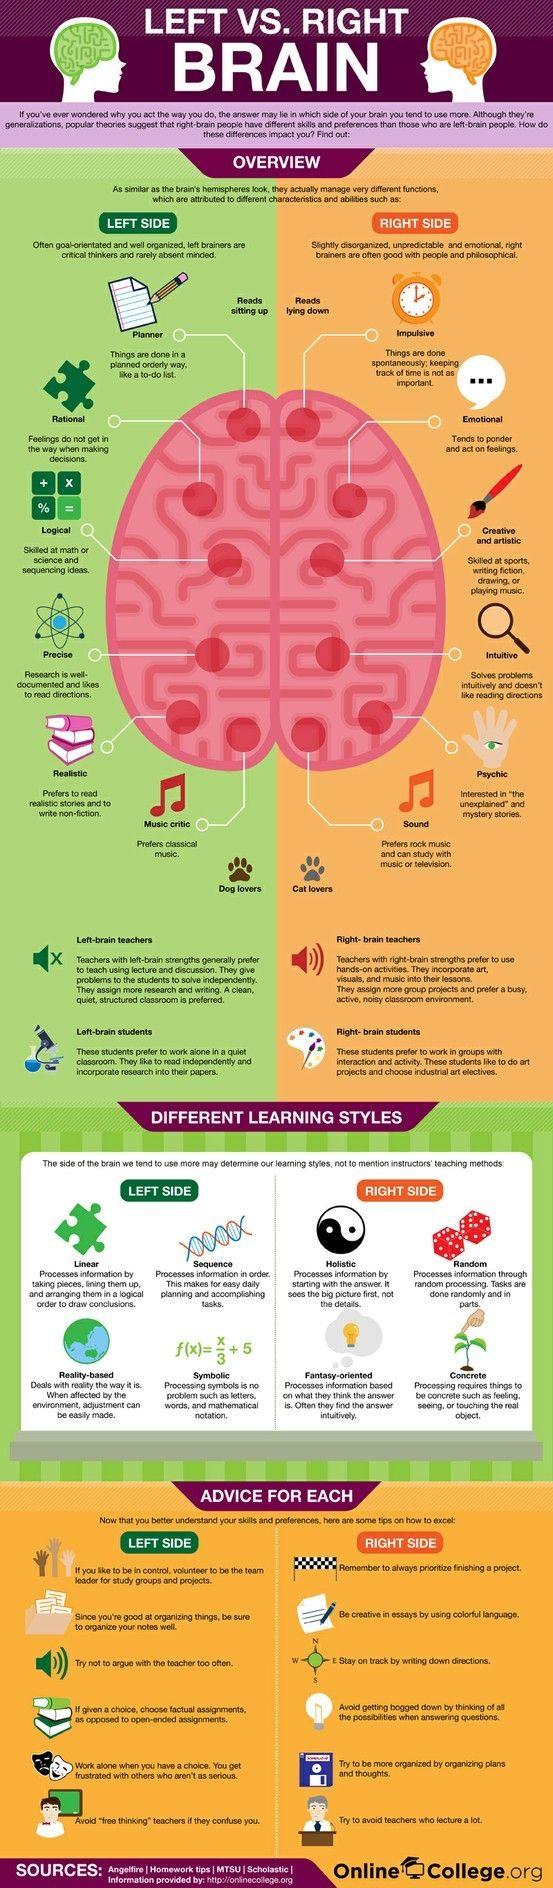 Left vs. Right Brain Infographic by myChelsss